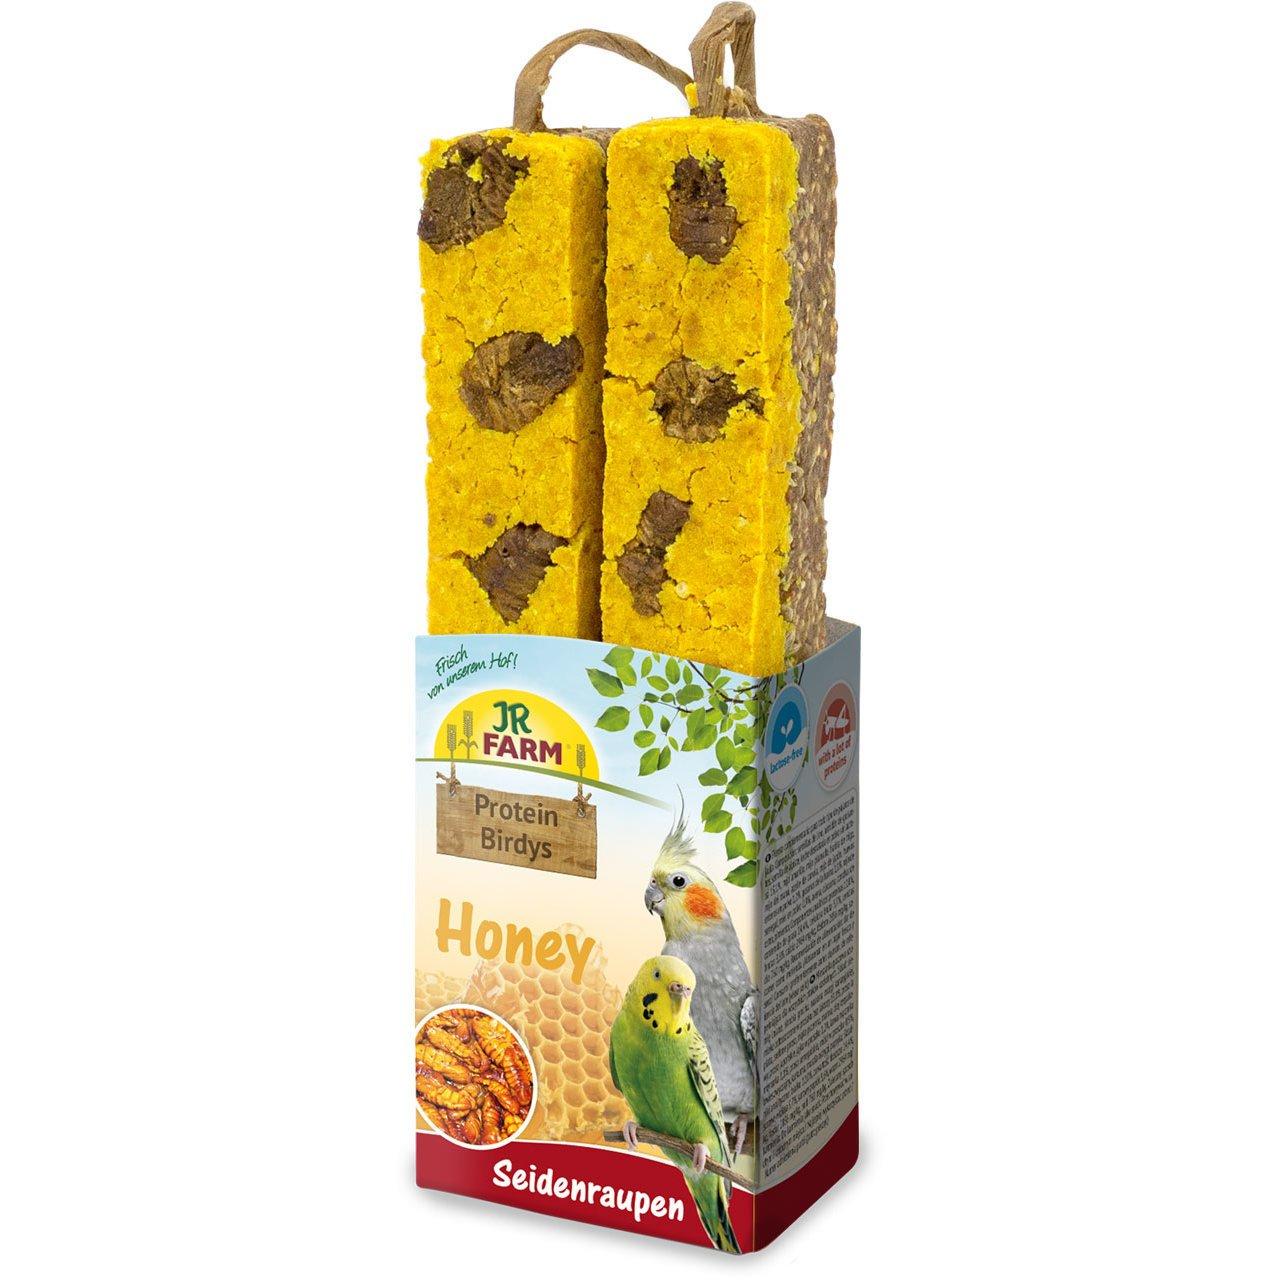 JR Farm Protein Birdys, Honey Seidenraupen 150g